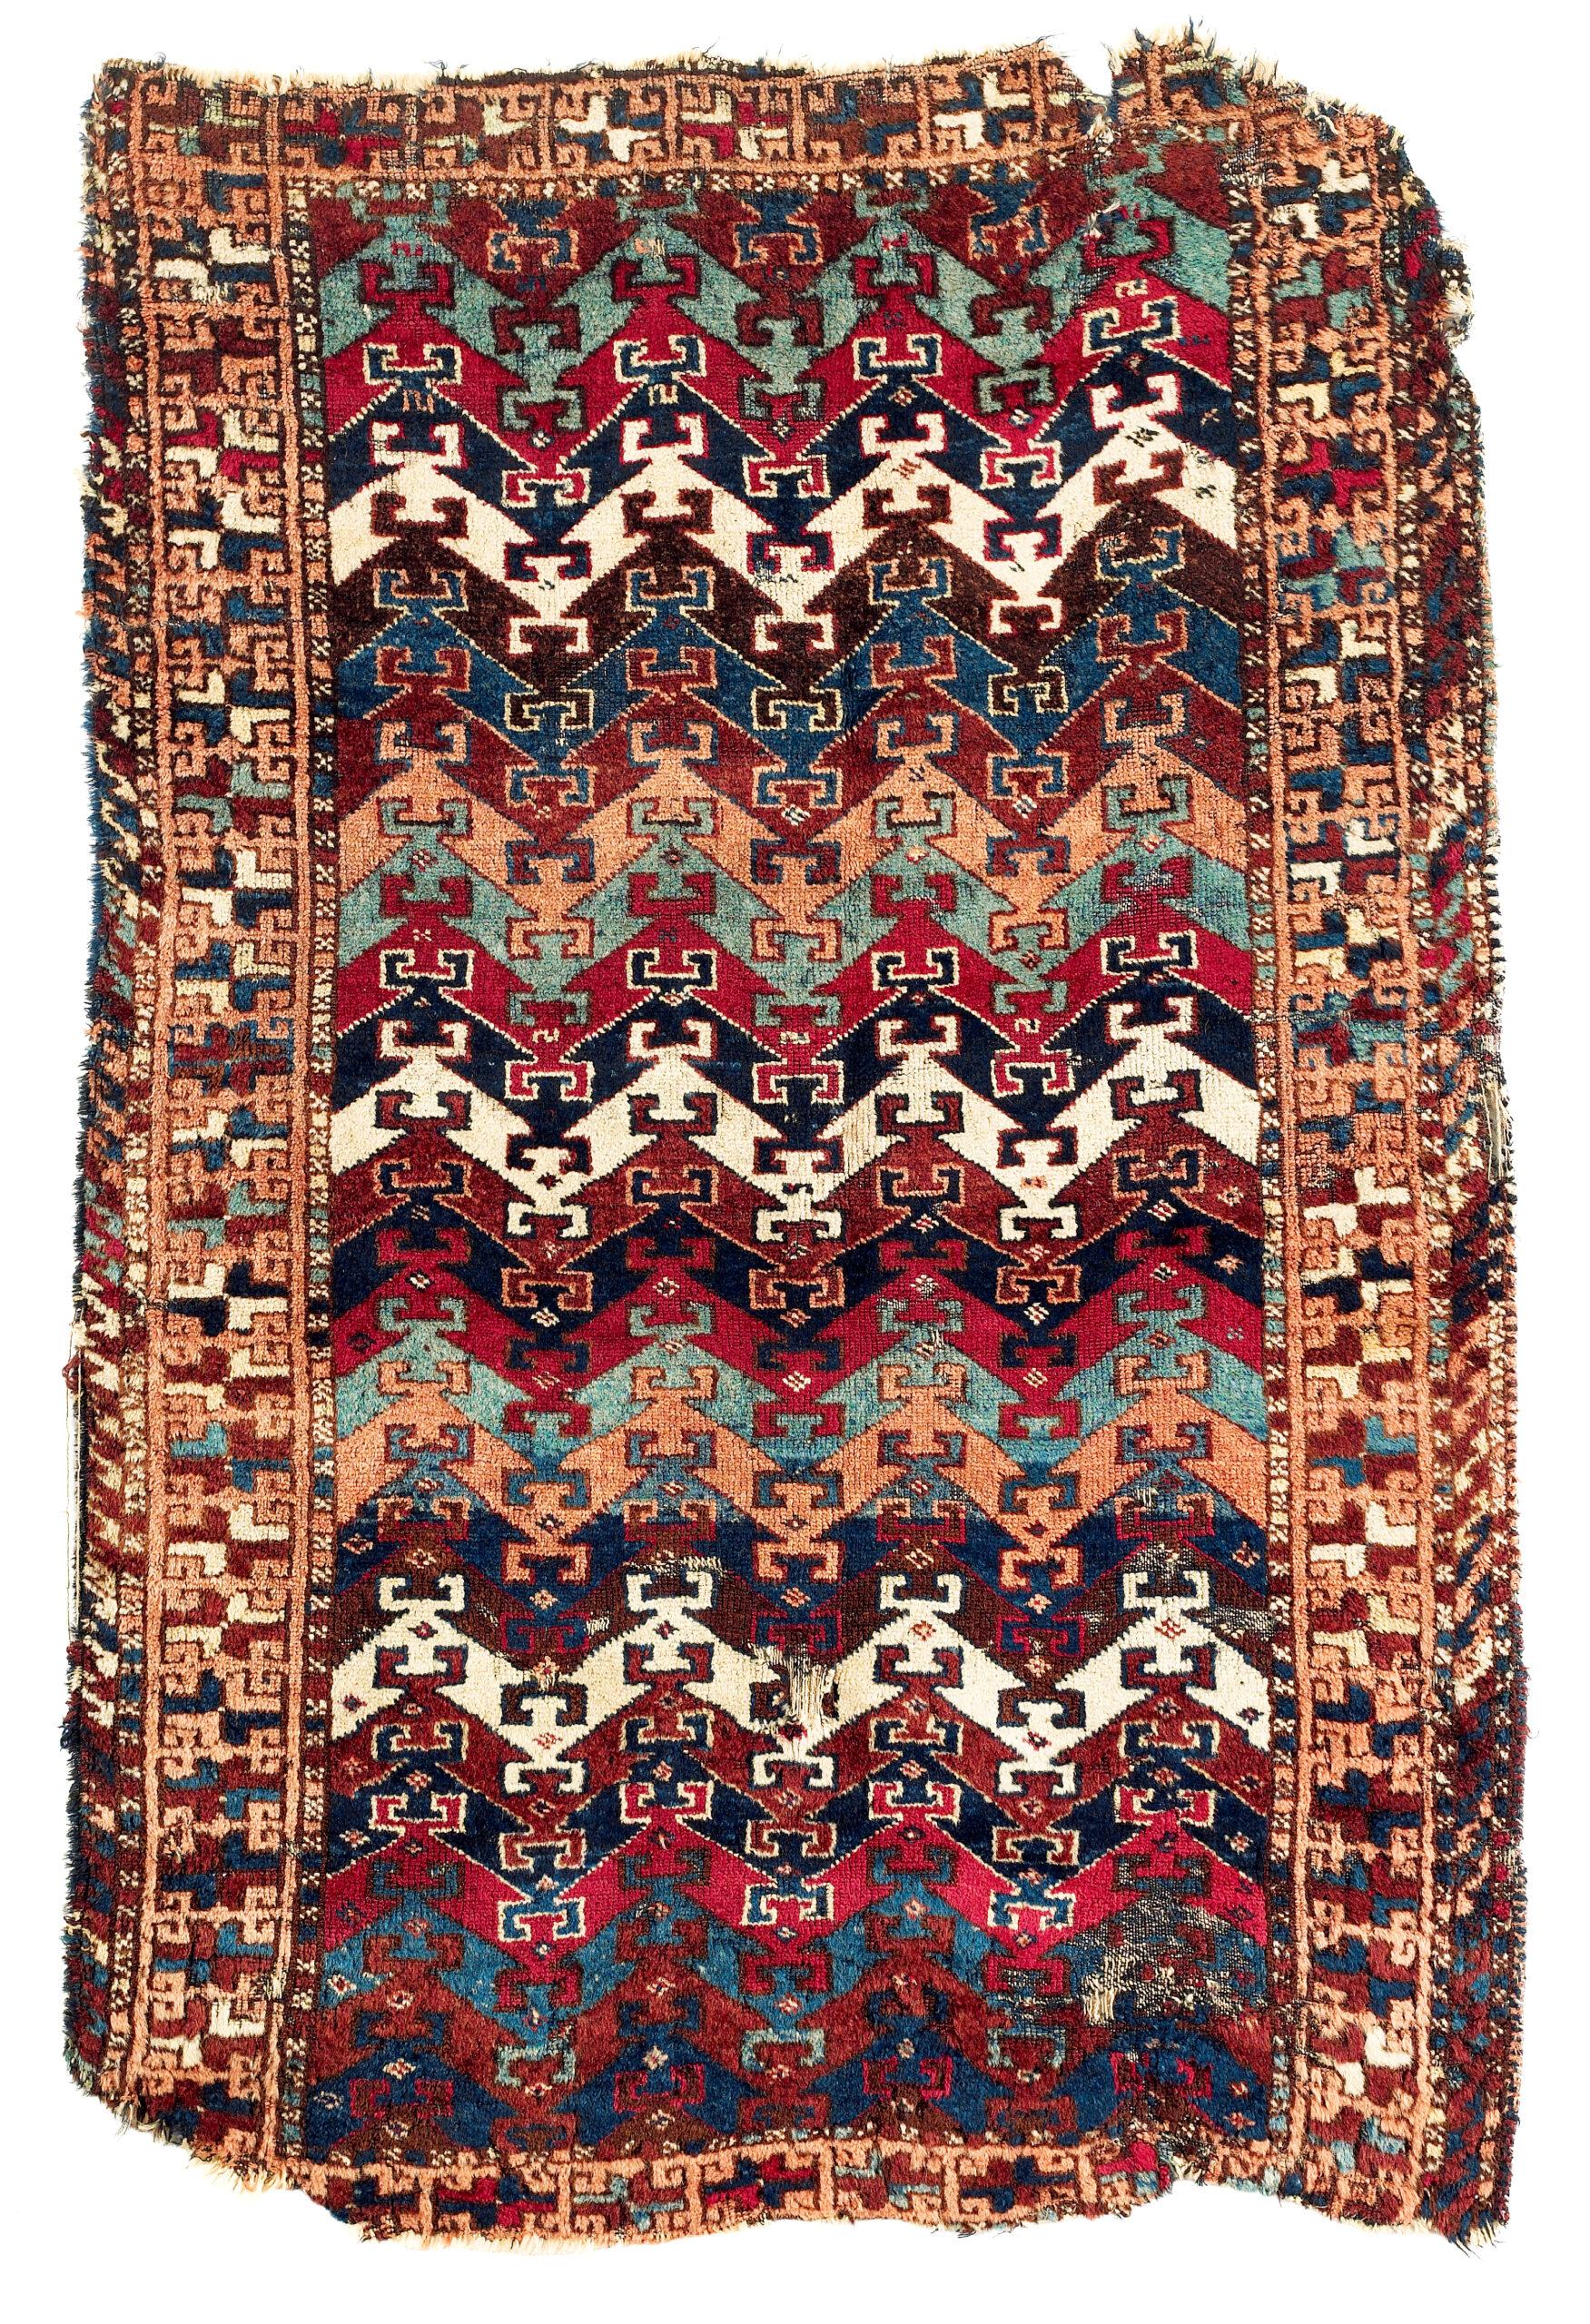 Trbal carpet belonging to Reshwan Kurds, 19th century, Eastern Anatolia